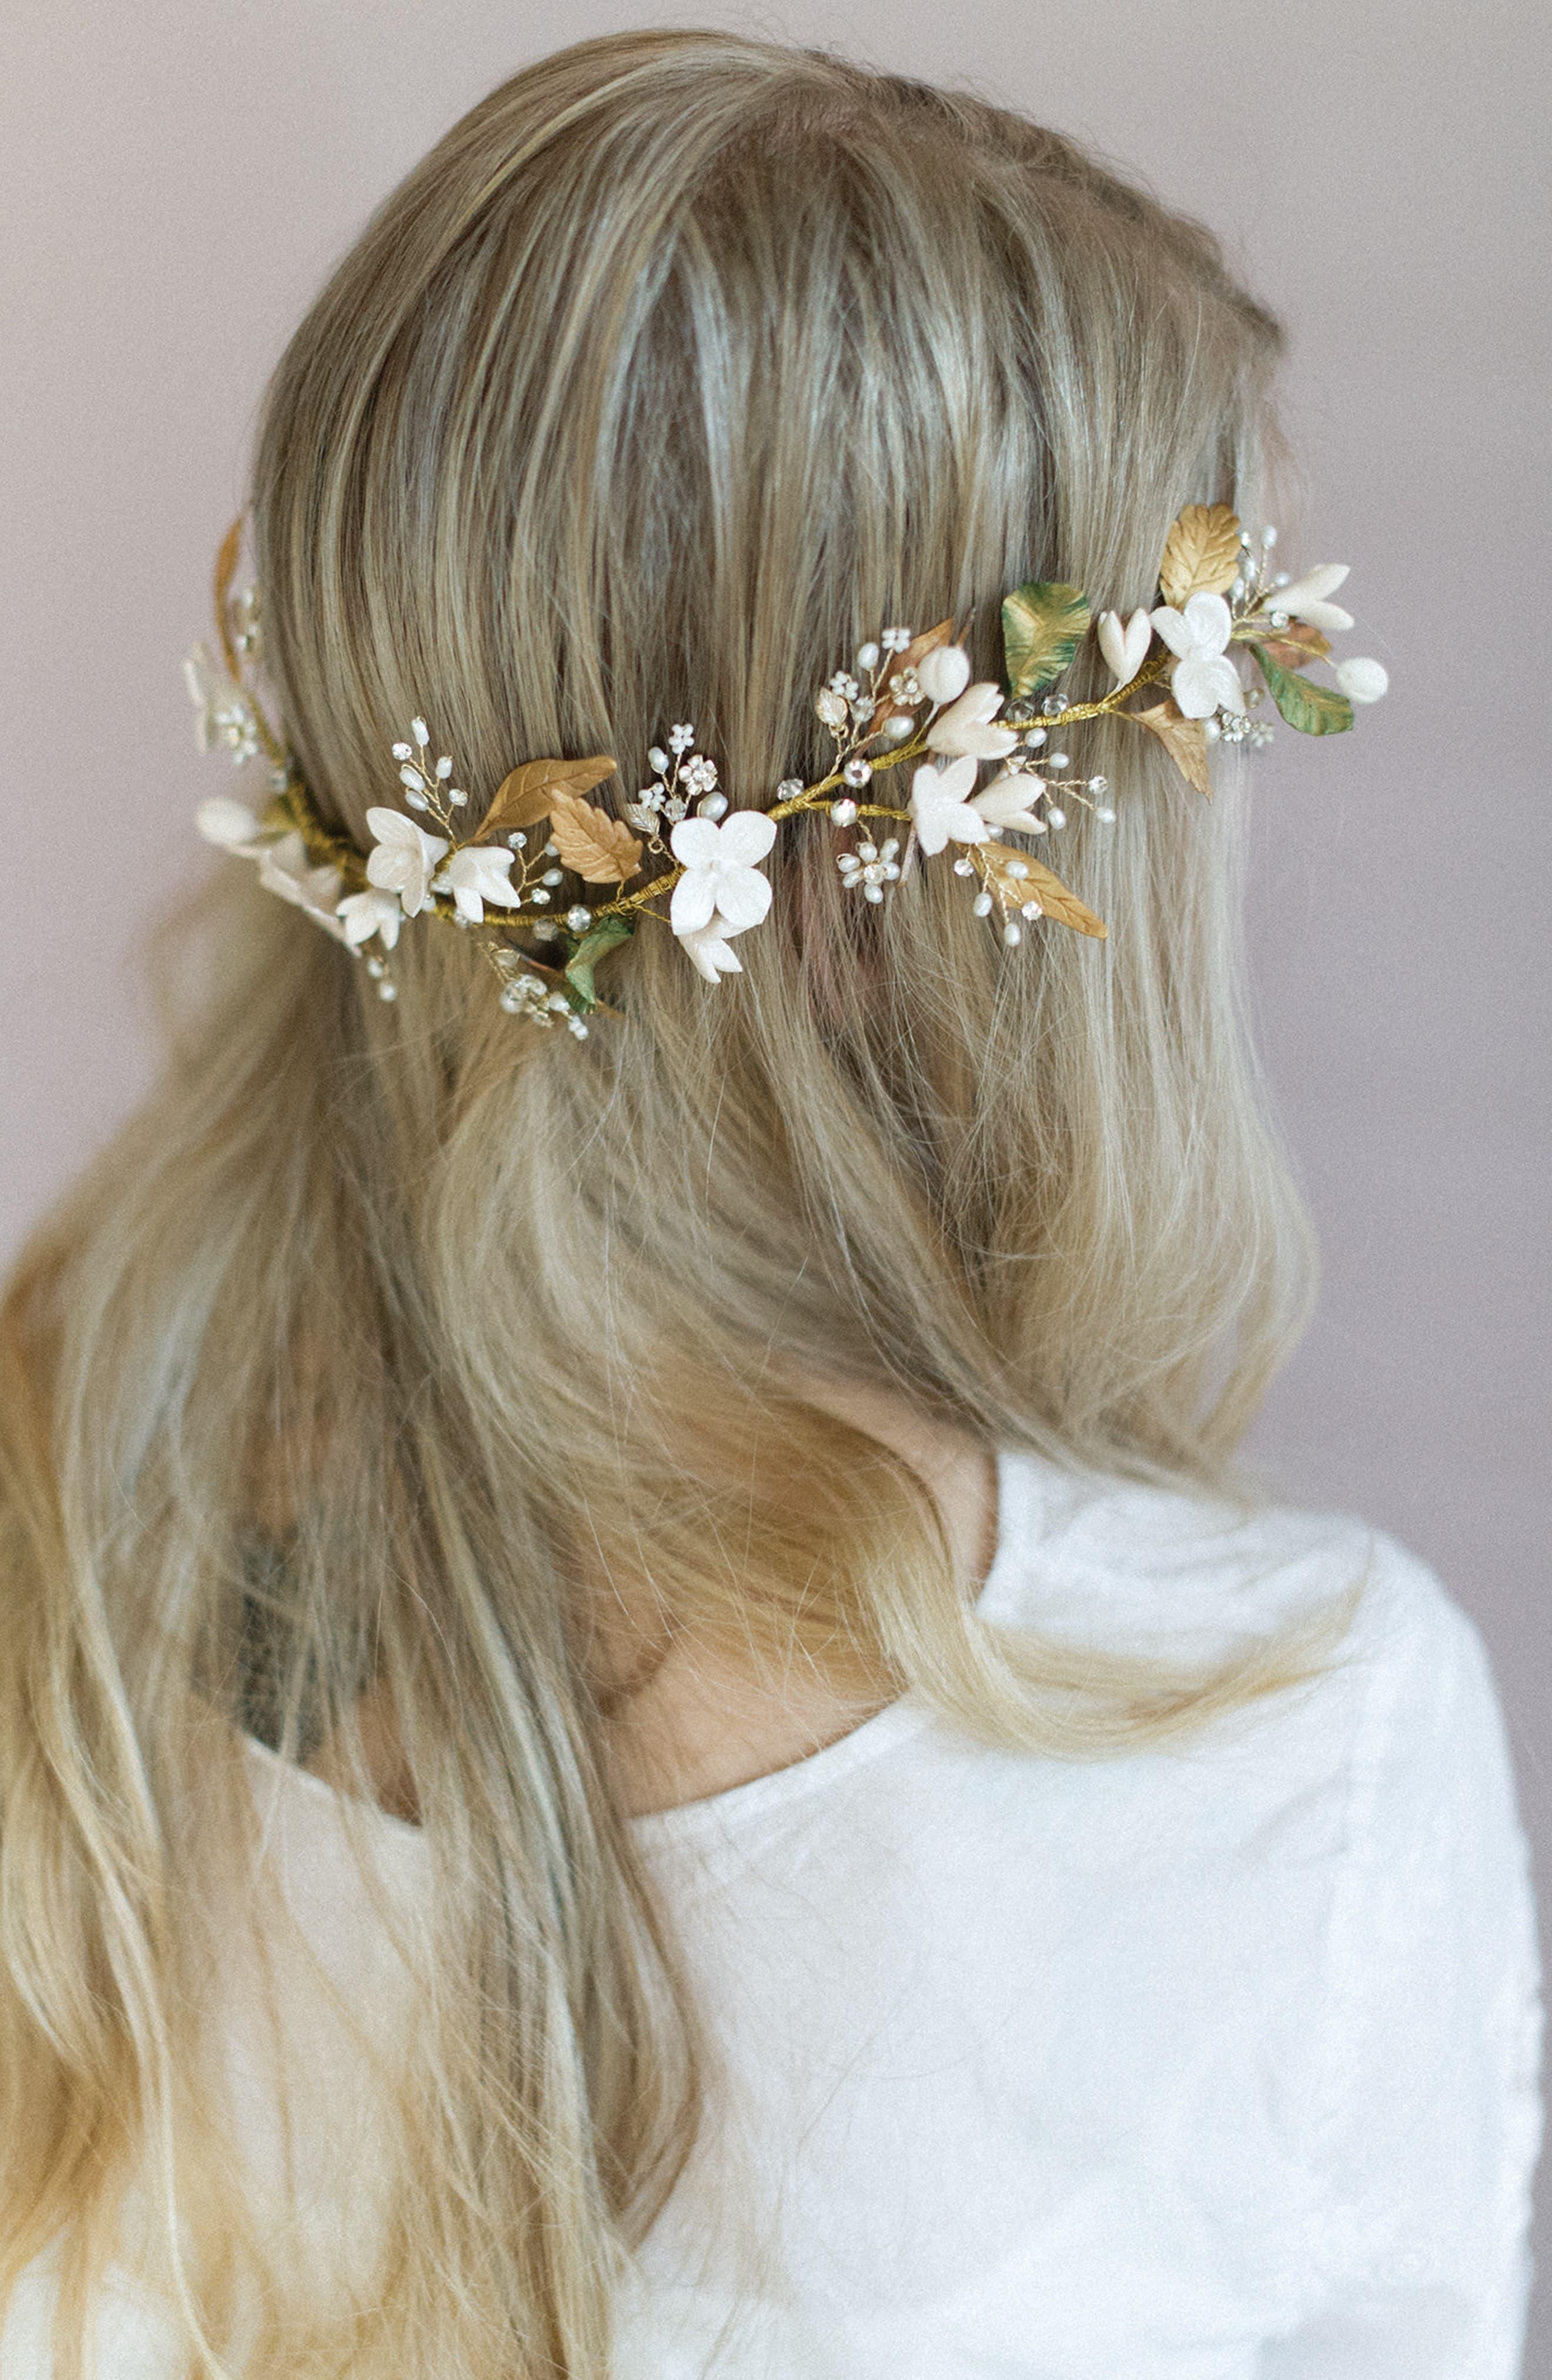 Floral Garden Headpiece,                         Main,                         color, Ivory/Gold